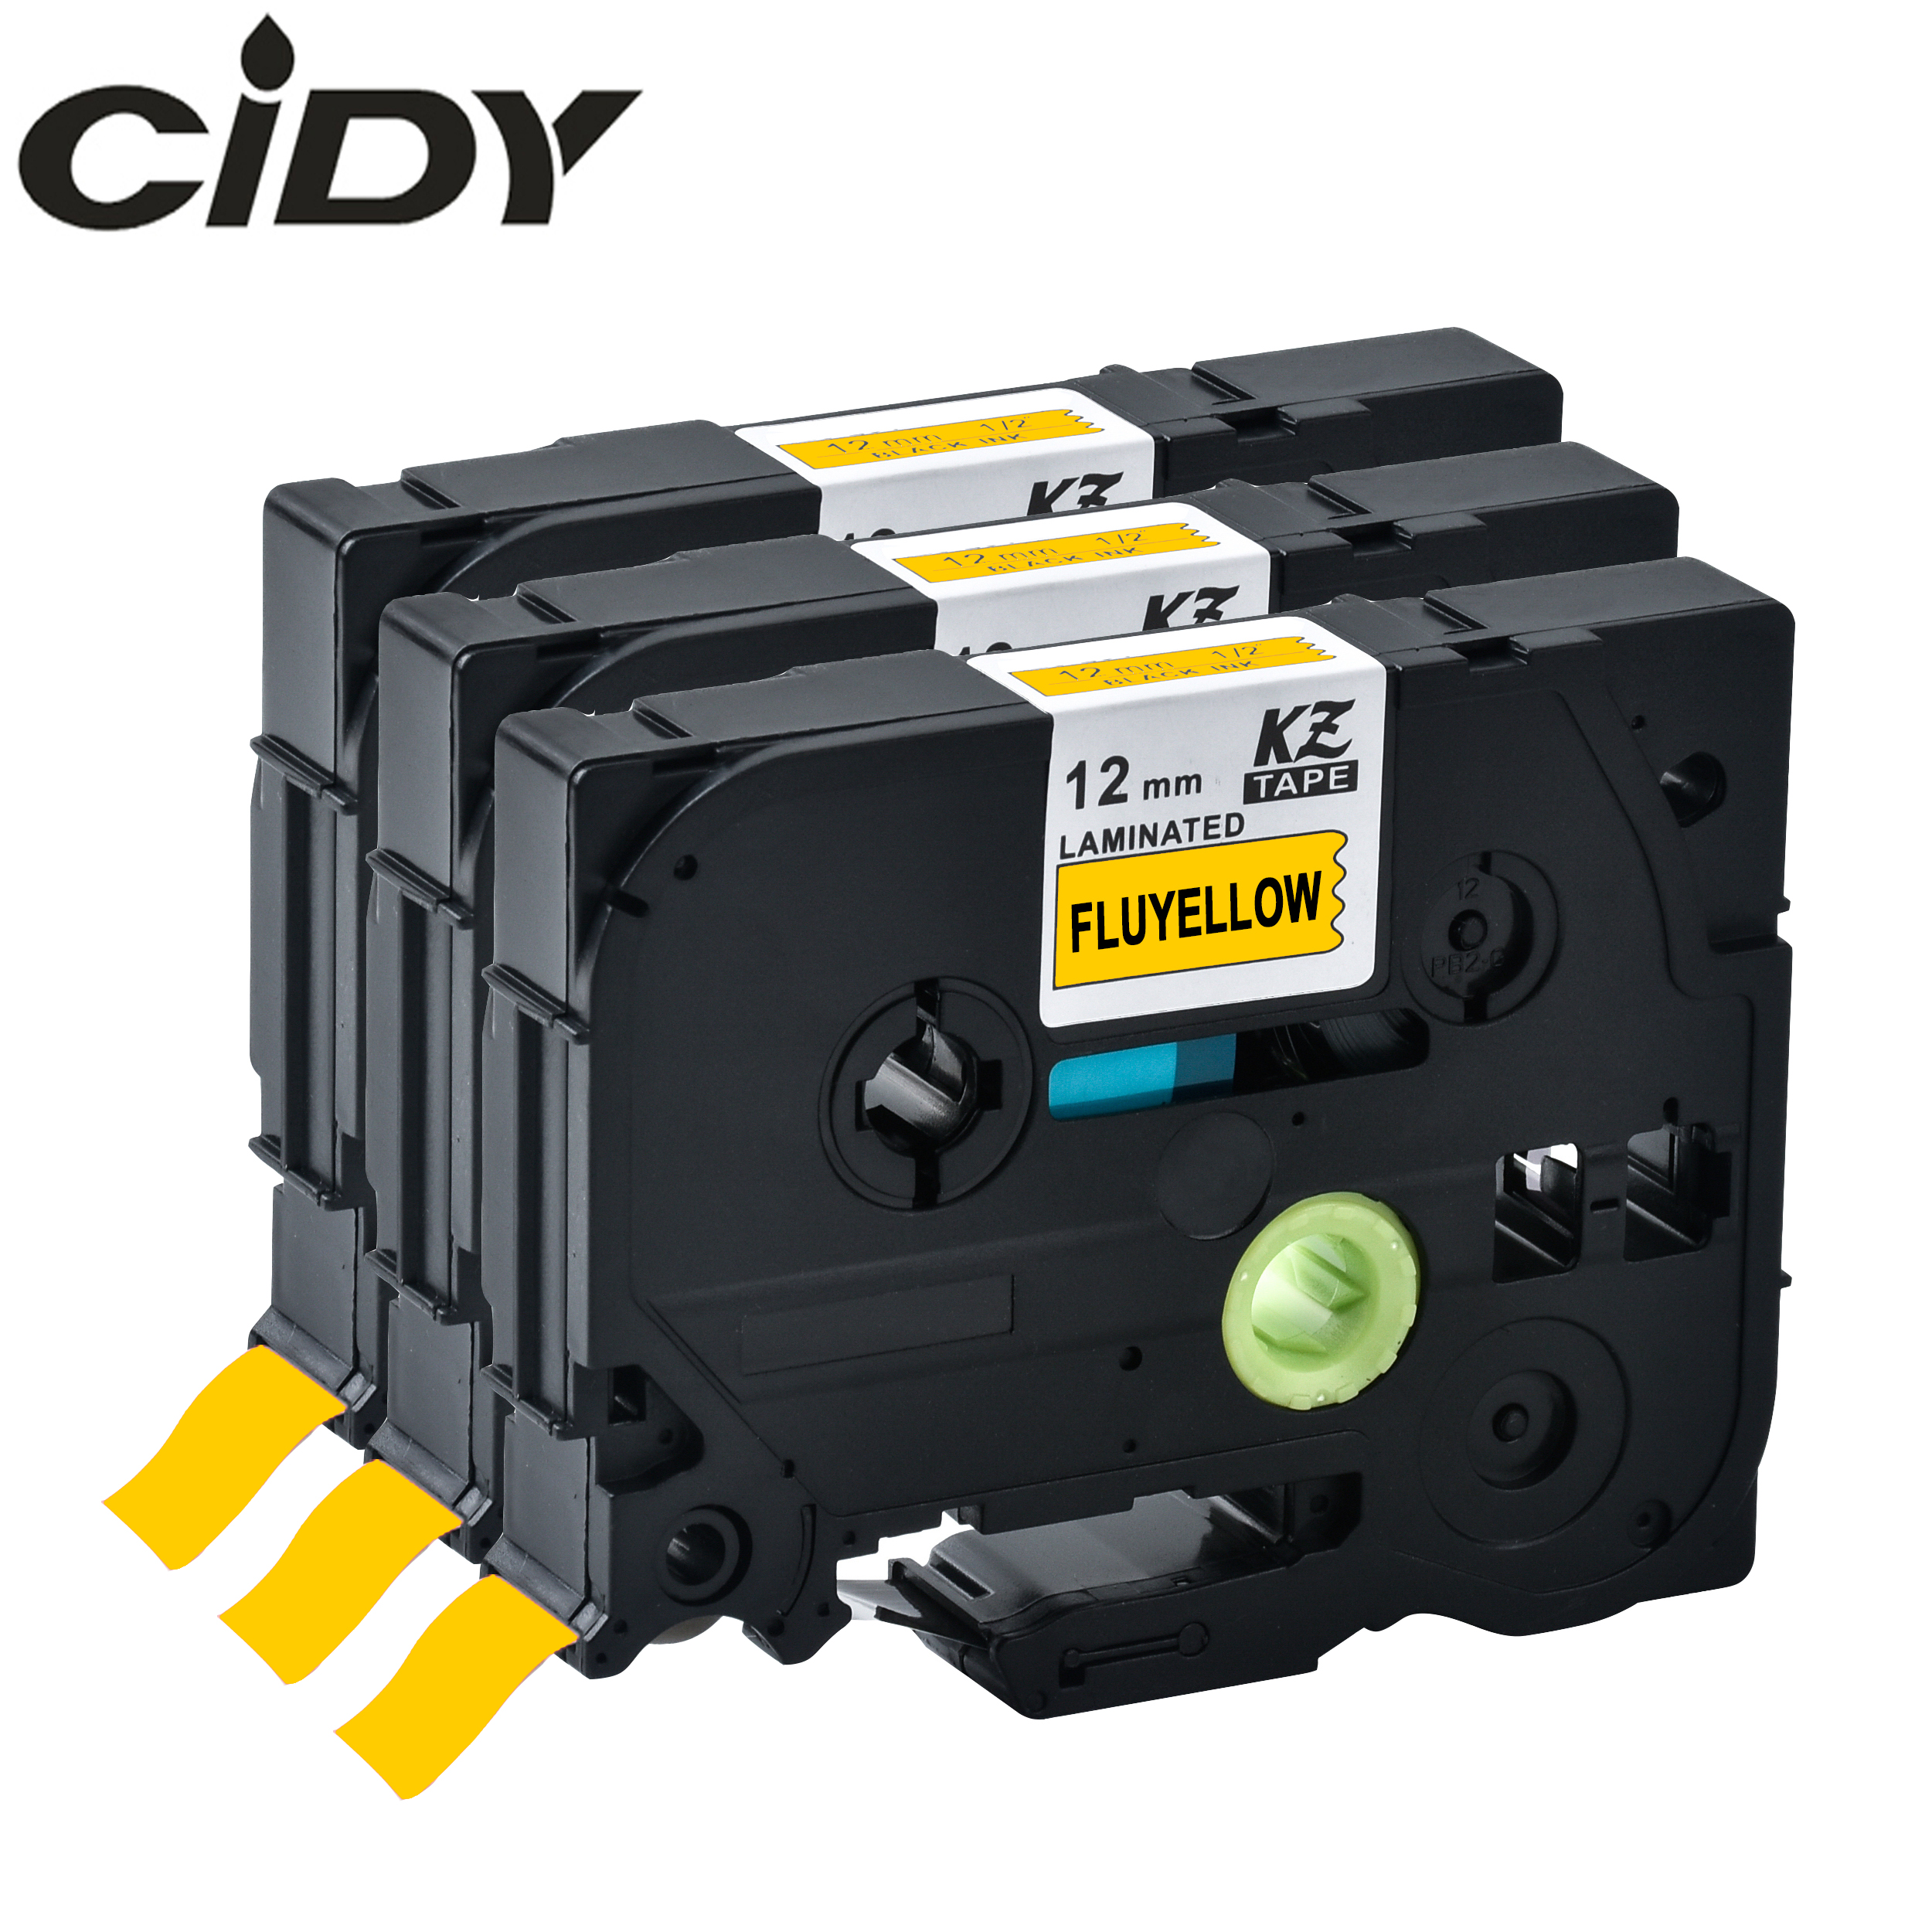 cidy Black on Fluorescent Yellow Laminated Label Tape Compatible TZE C31 TZ C31 TZE C31 TZ C31 For Brother Printers|brother tze|tze brother|brother tz - title=